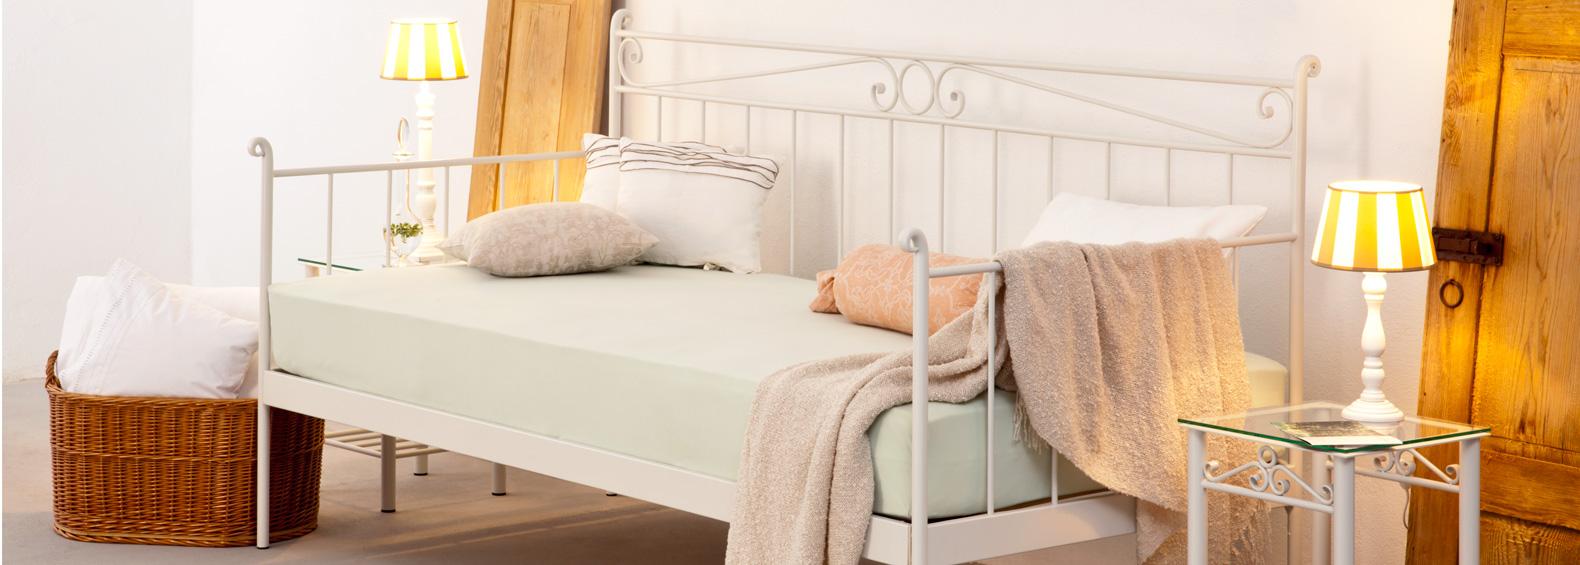 Ob Single-Apartment oder Wohnzimmer: unser Eisensofa »Frances«